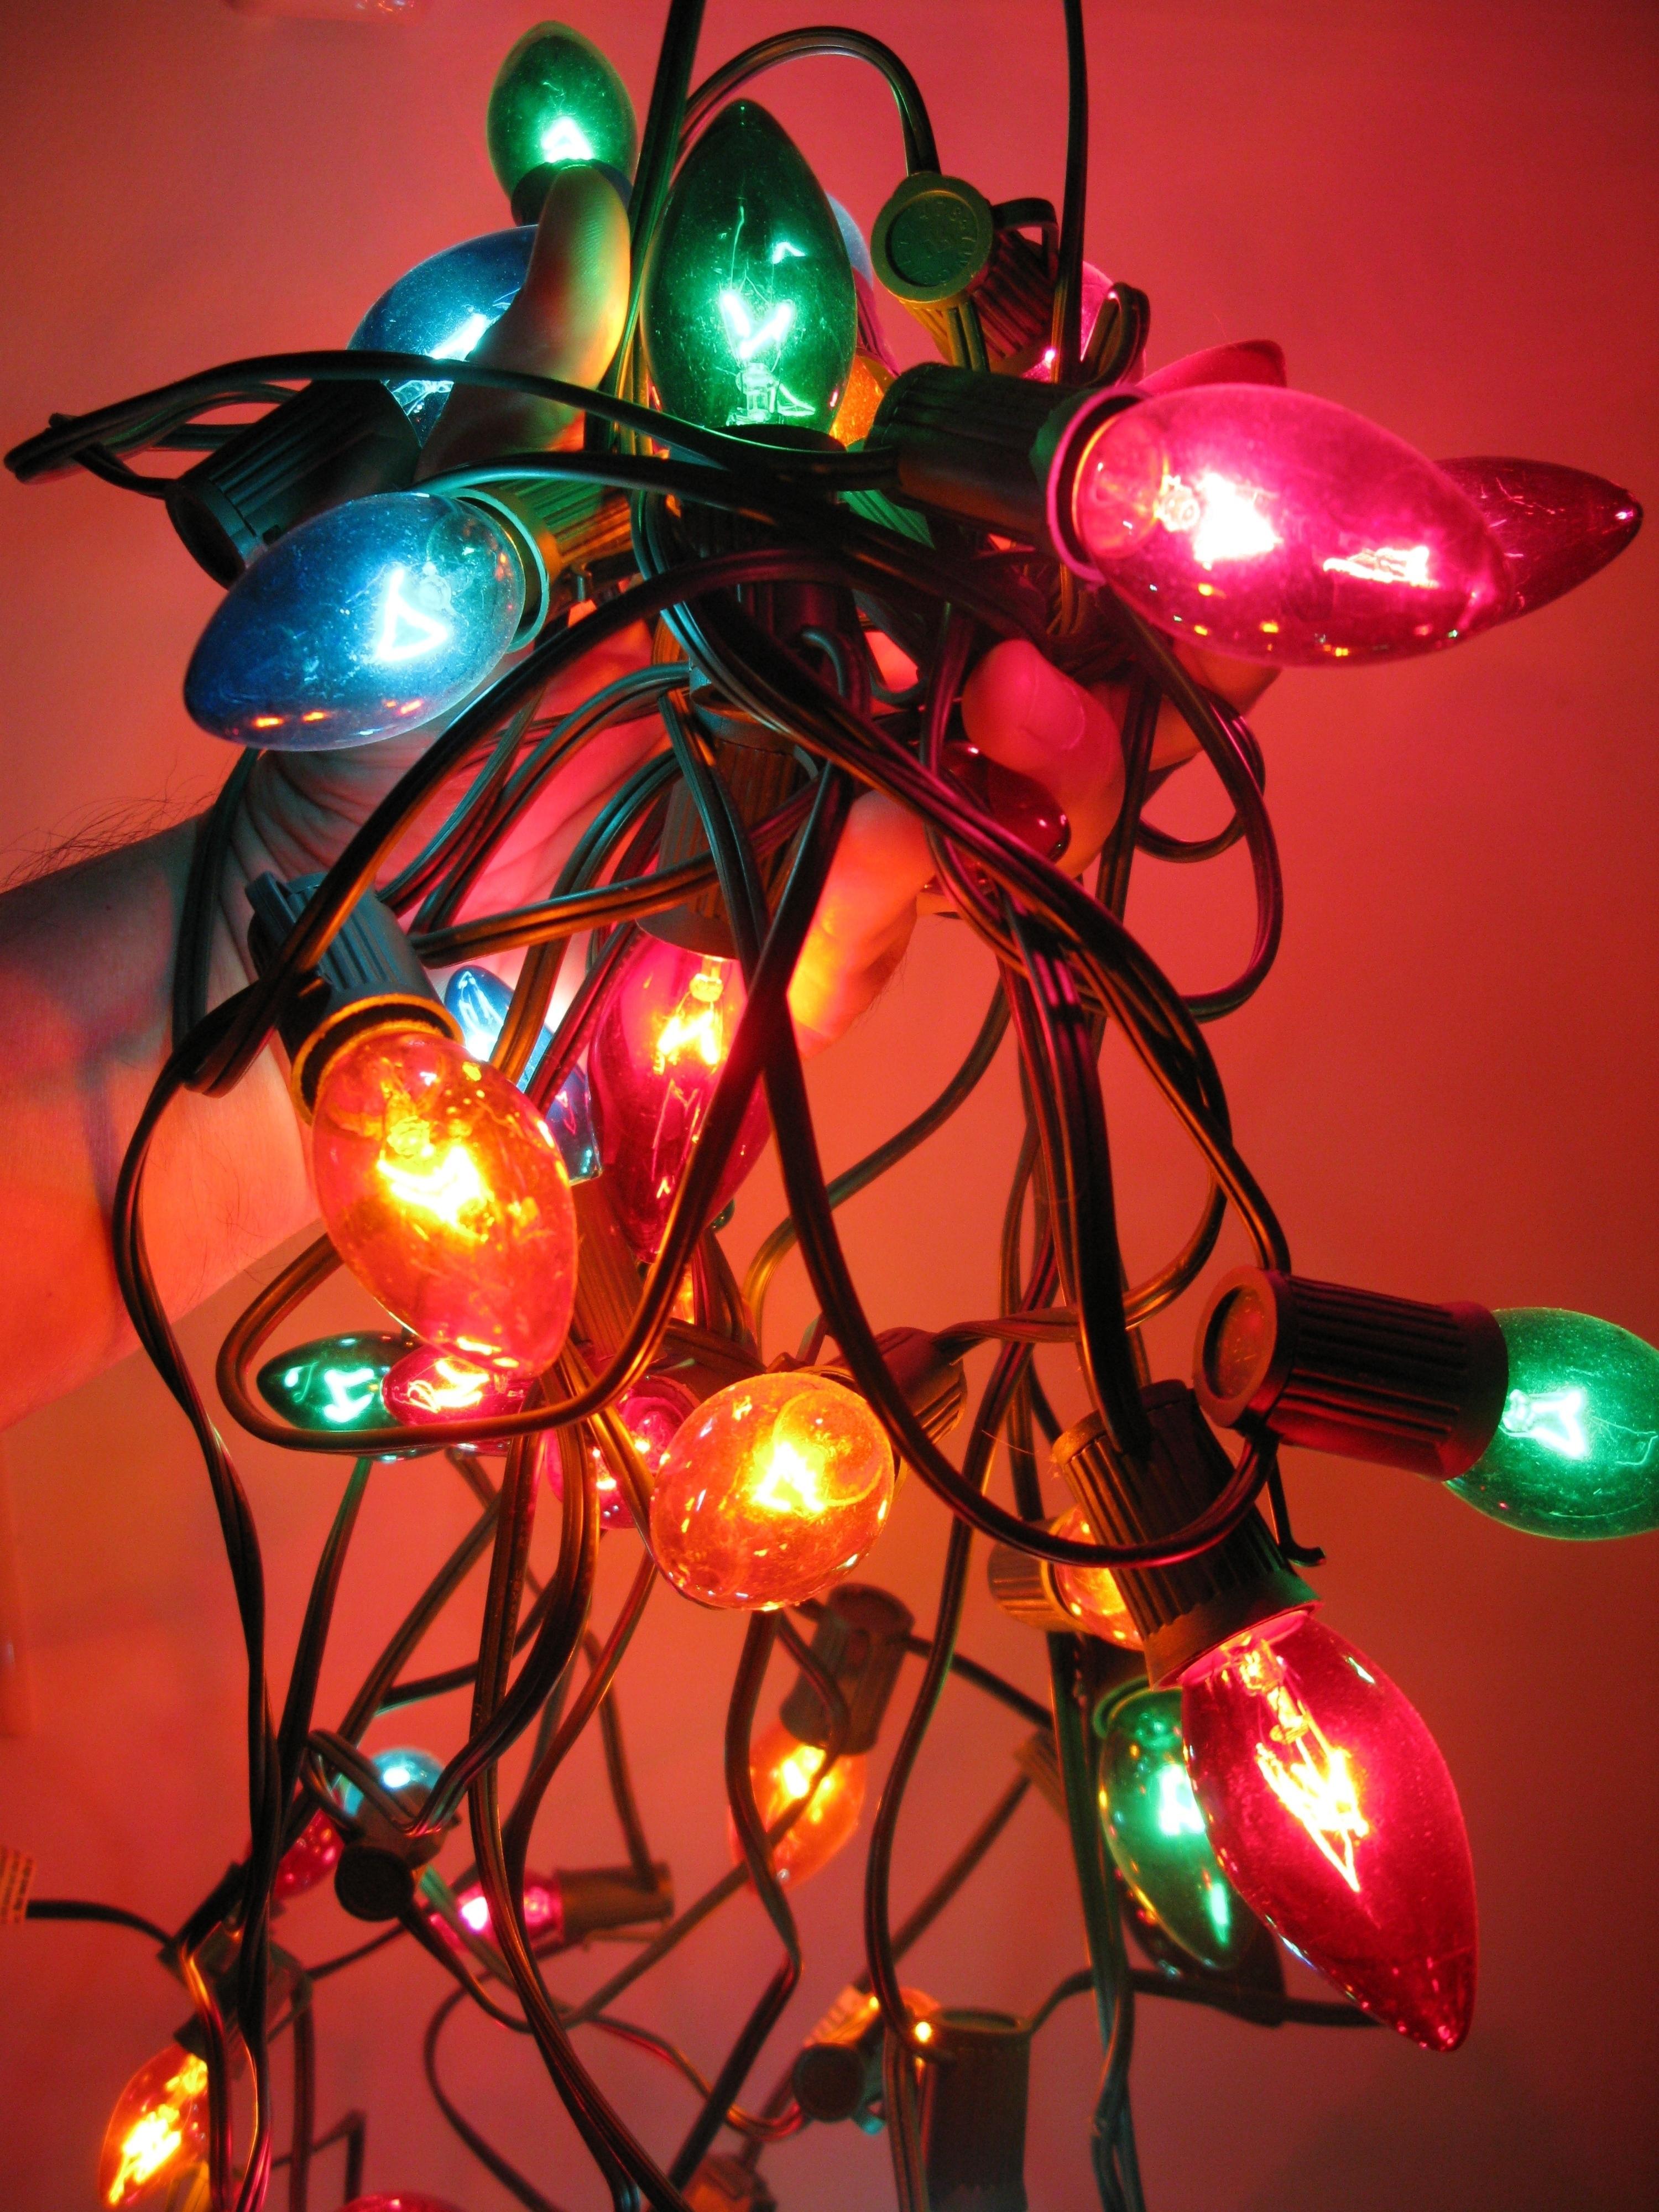 643c37e7ca1930cf9b68_31f0af03cd4f8656703f_holiday_lights_PROfrankieleon.JPG